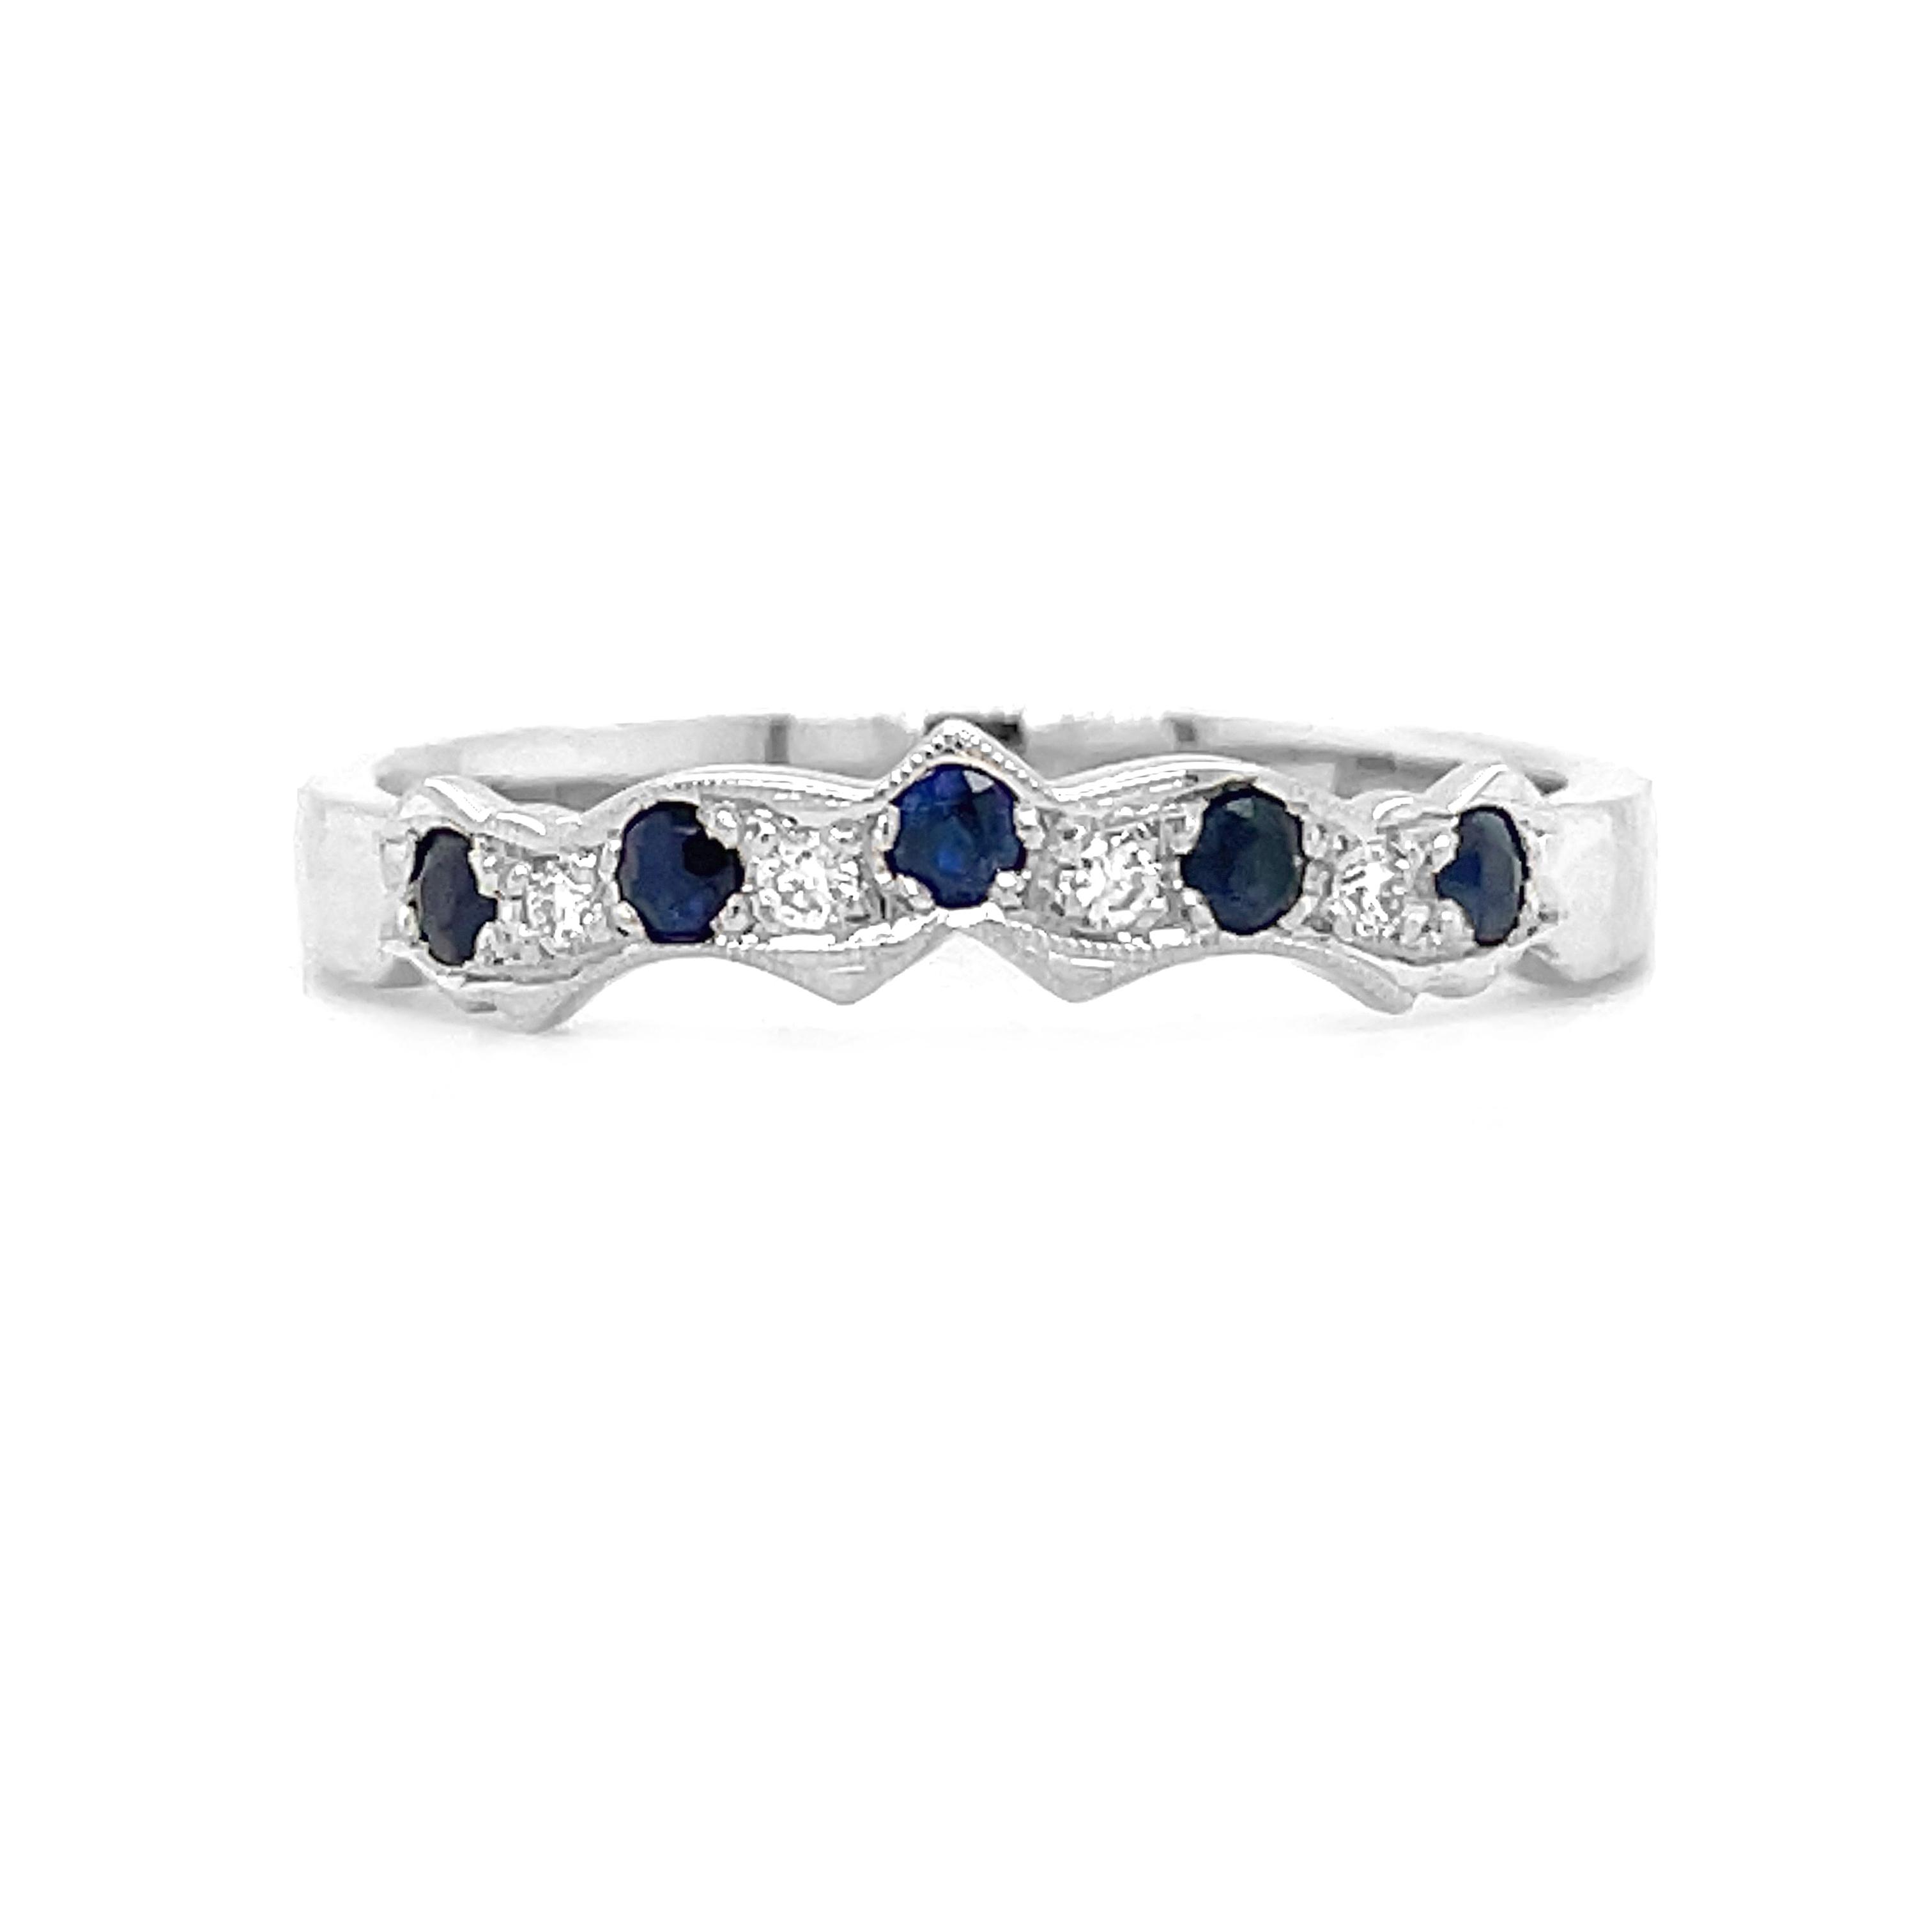 White Gold Sapphire & Diamond Claddagh Wedding Ring